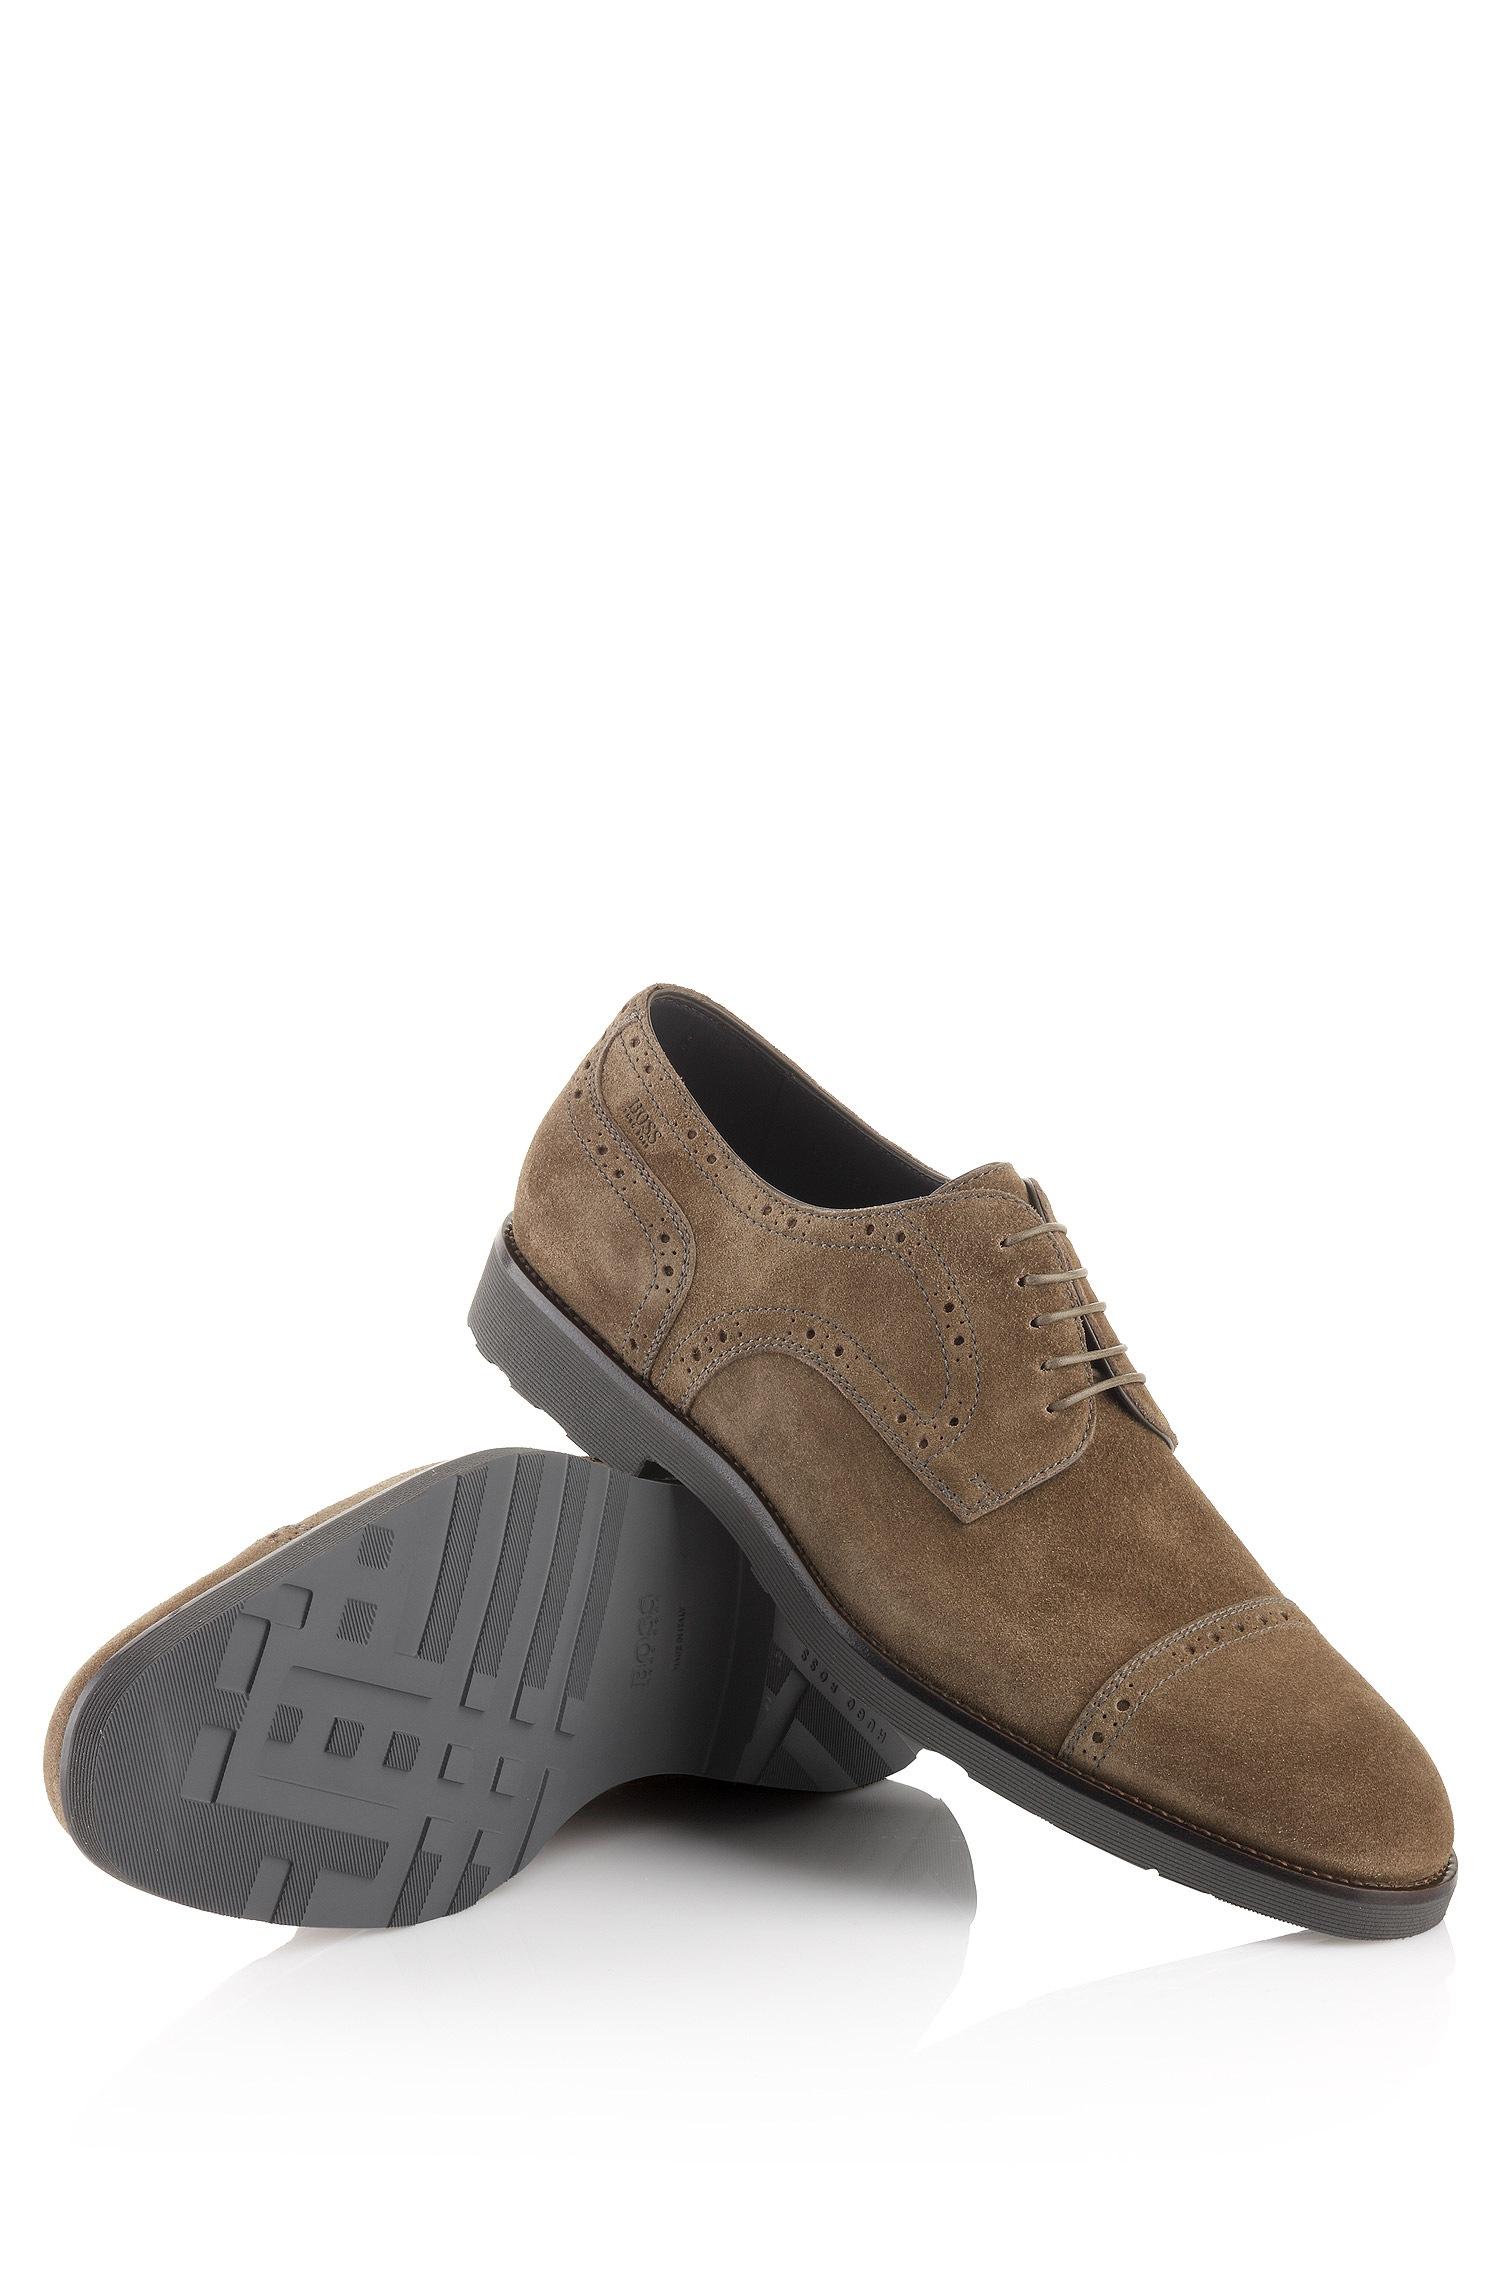 Hugo Boss Shoes Online Canada